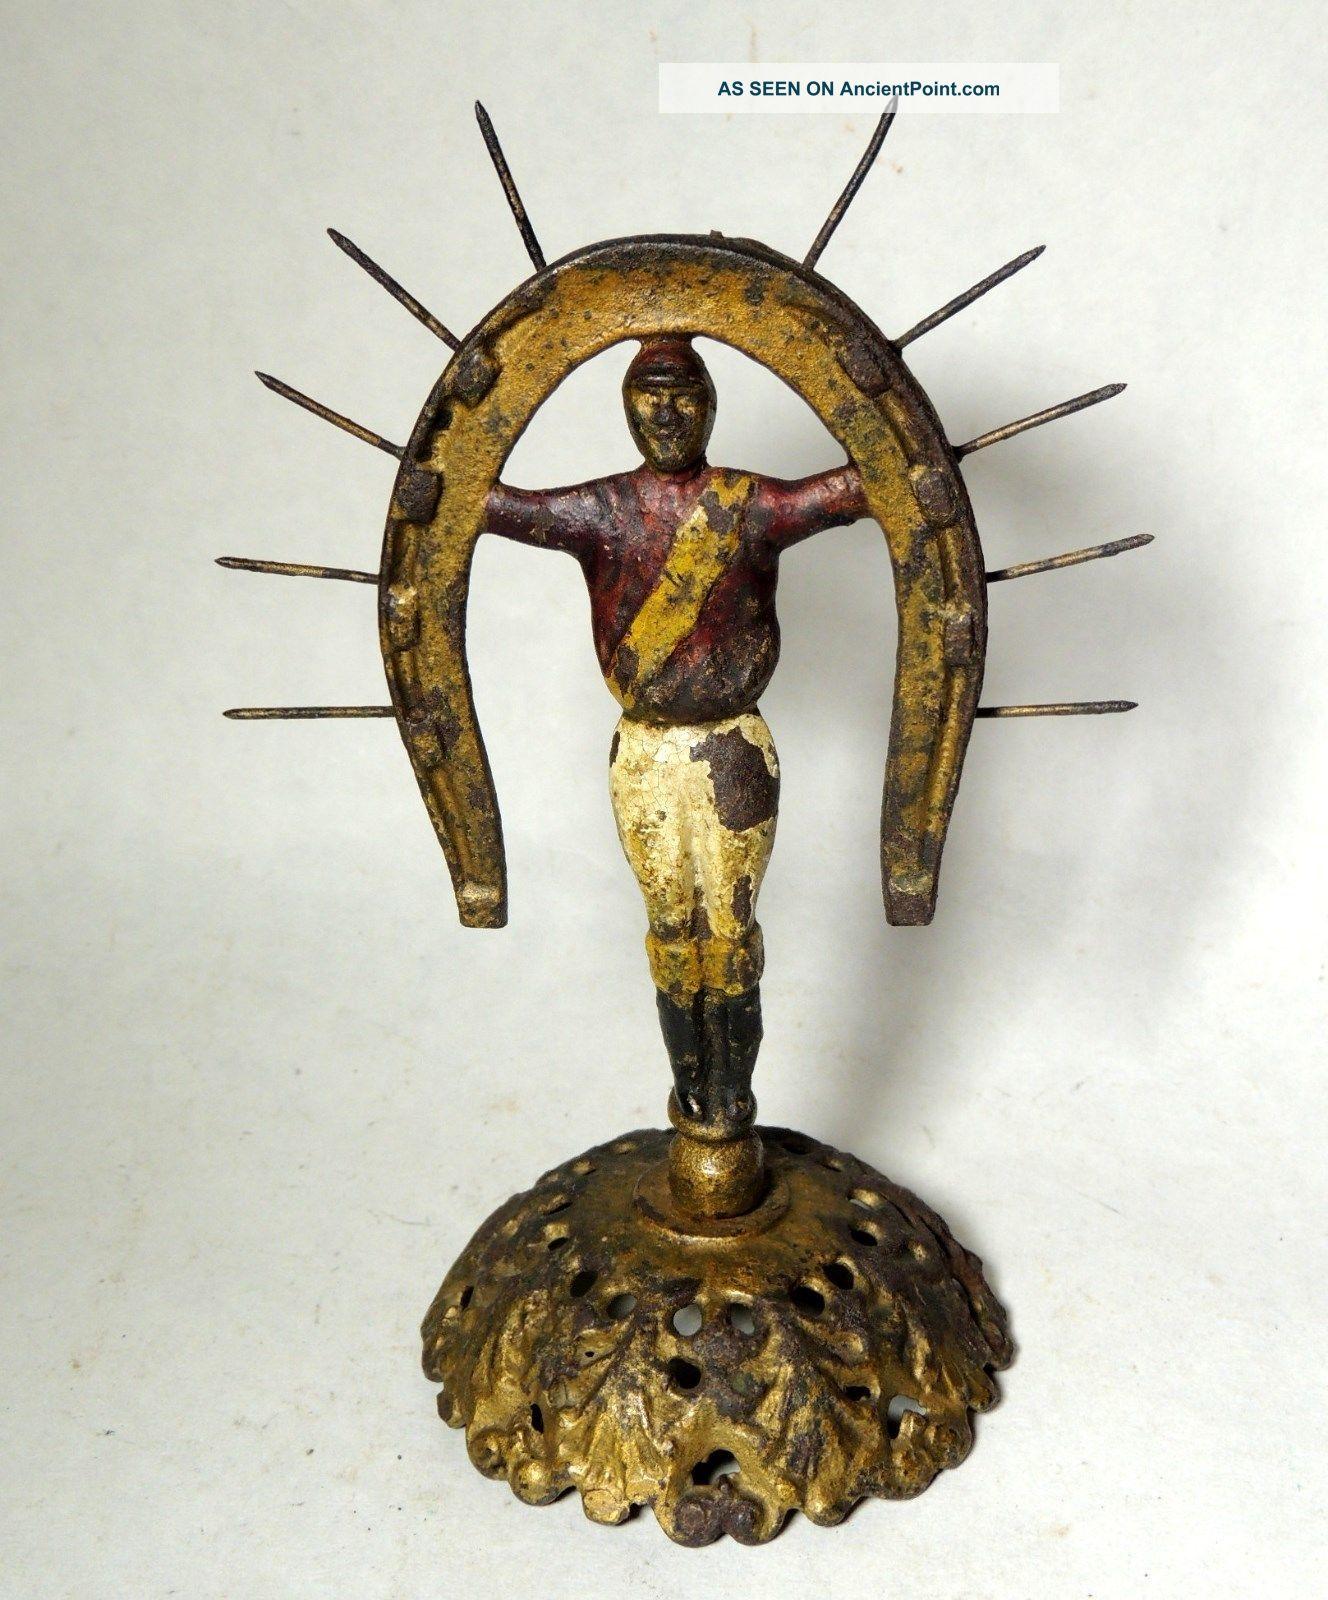 Antque Vtg 19th Century Cast Iron Horseshoe Jockey Statue Horse Race Trophy? Metalware photo